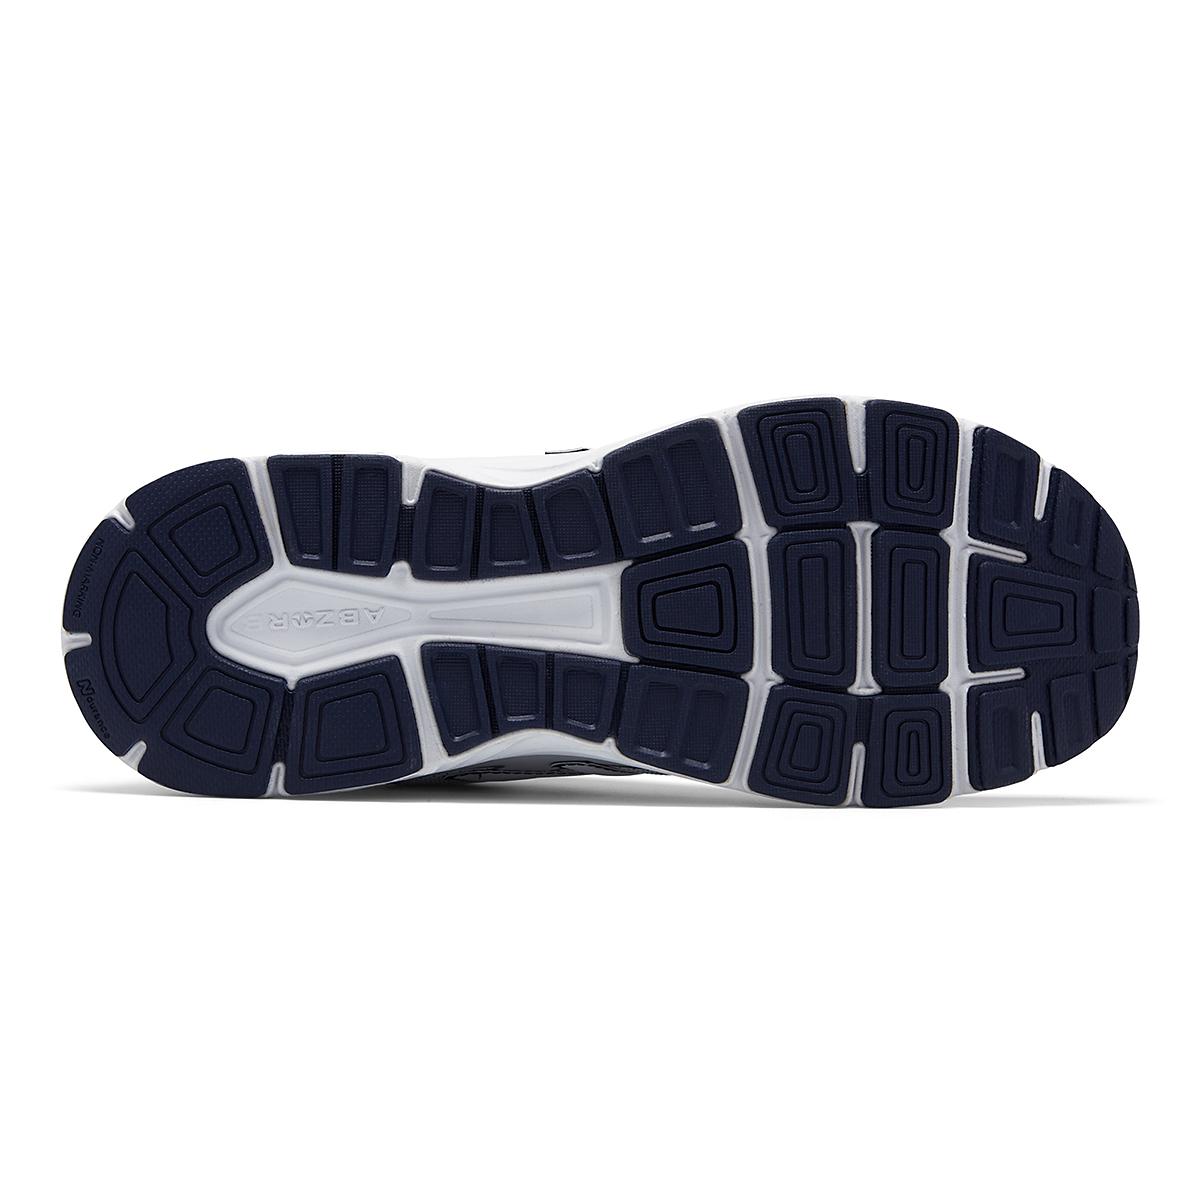 Men's New Balance 840v2 Leather Walking Shoe - Color: White/Navy - Size: 7 - Width: Wide, White/Navy, large, image 4